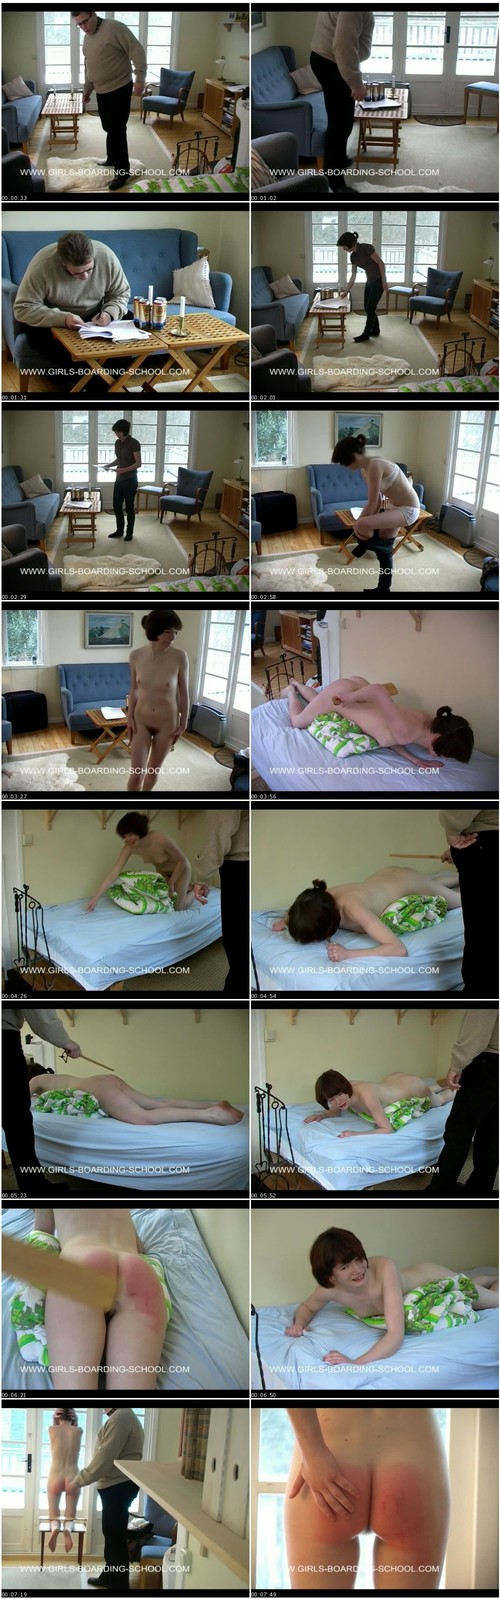 spanking046_thumb_m.jpg